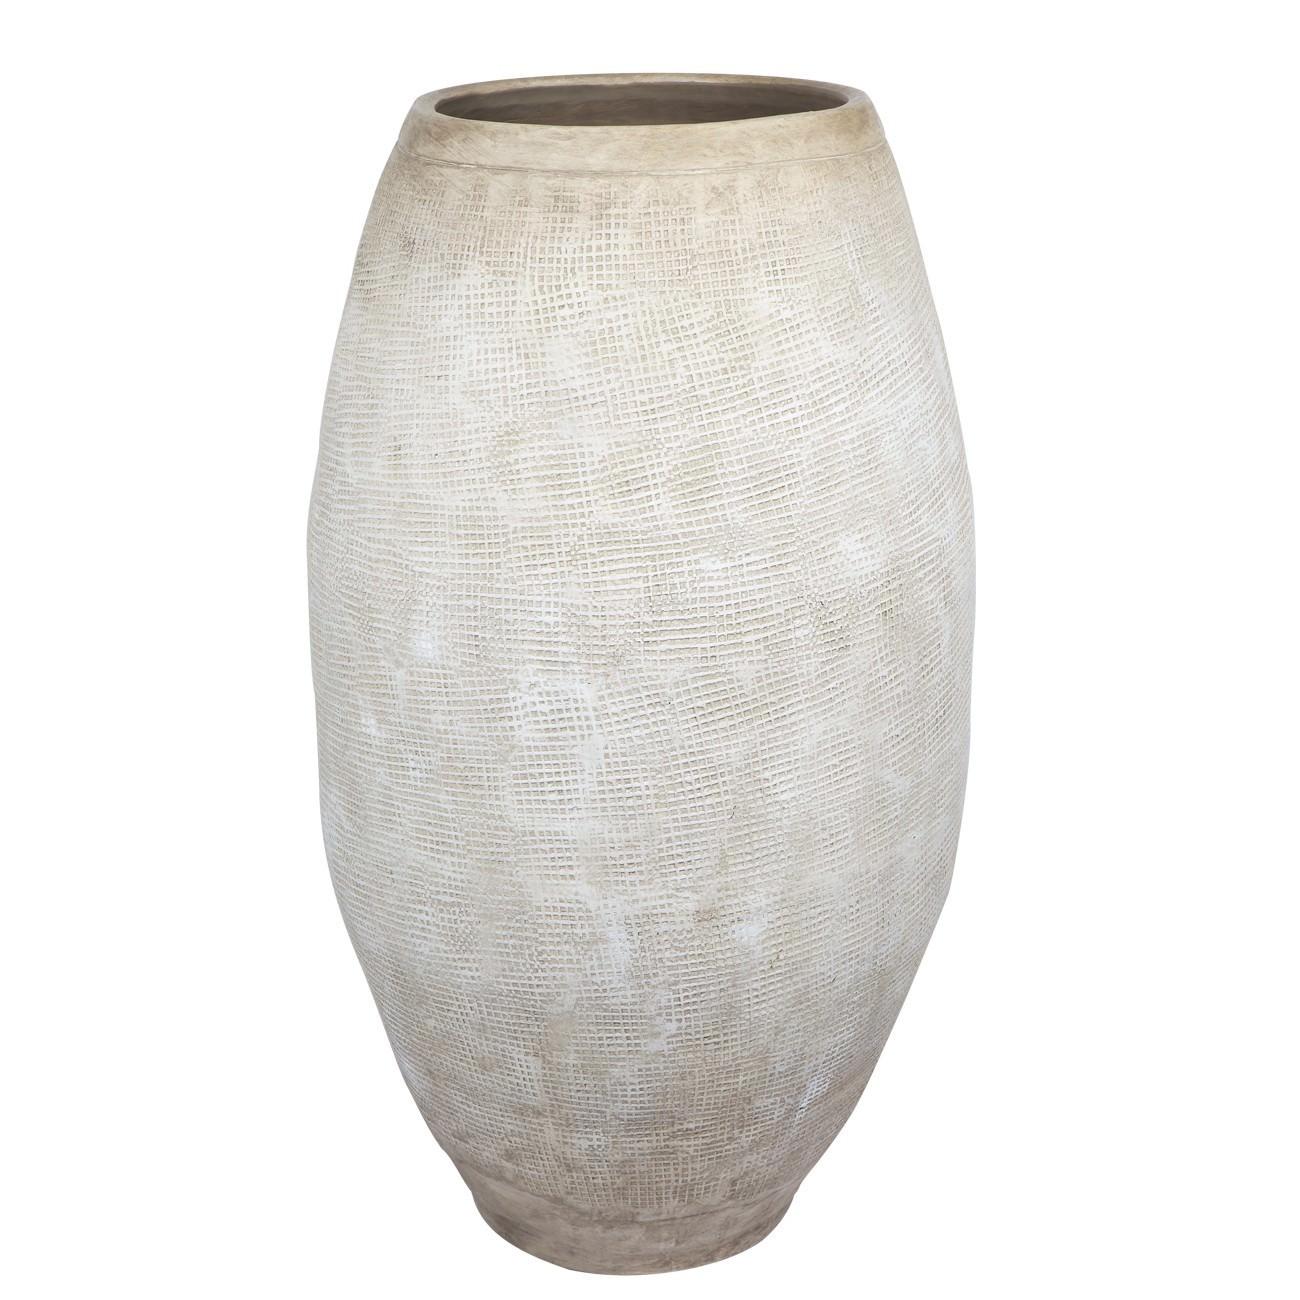 Gulf Terracotta Urn, Large